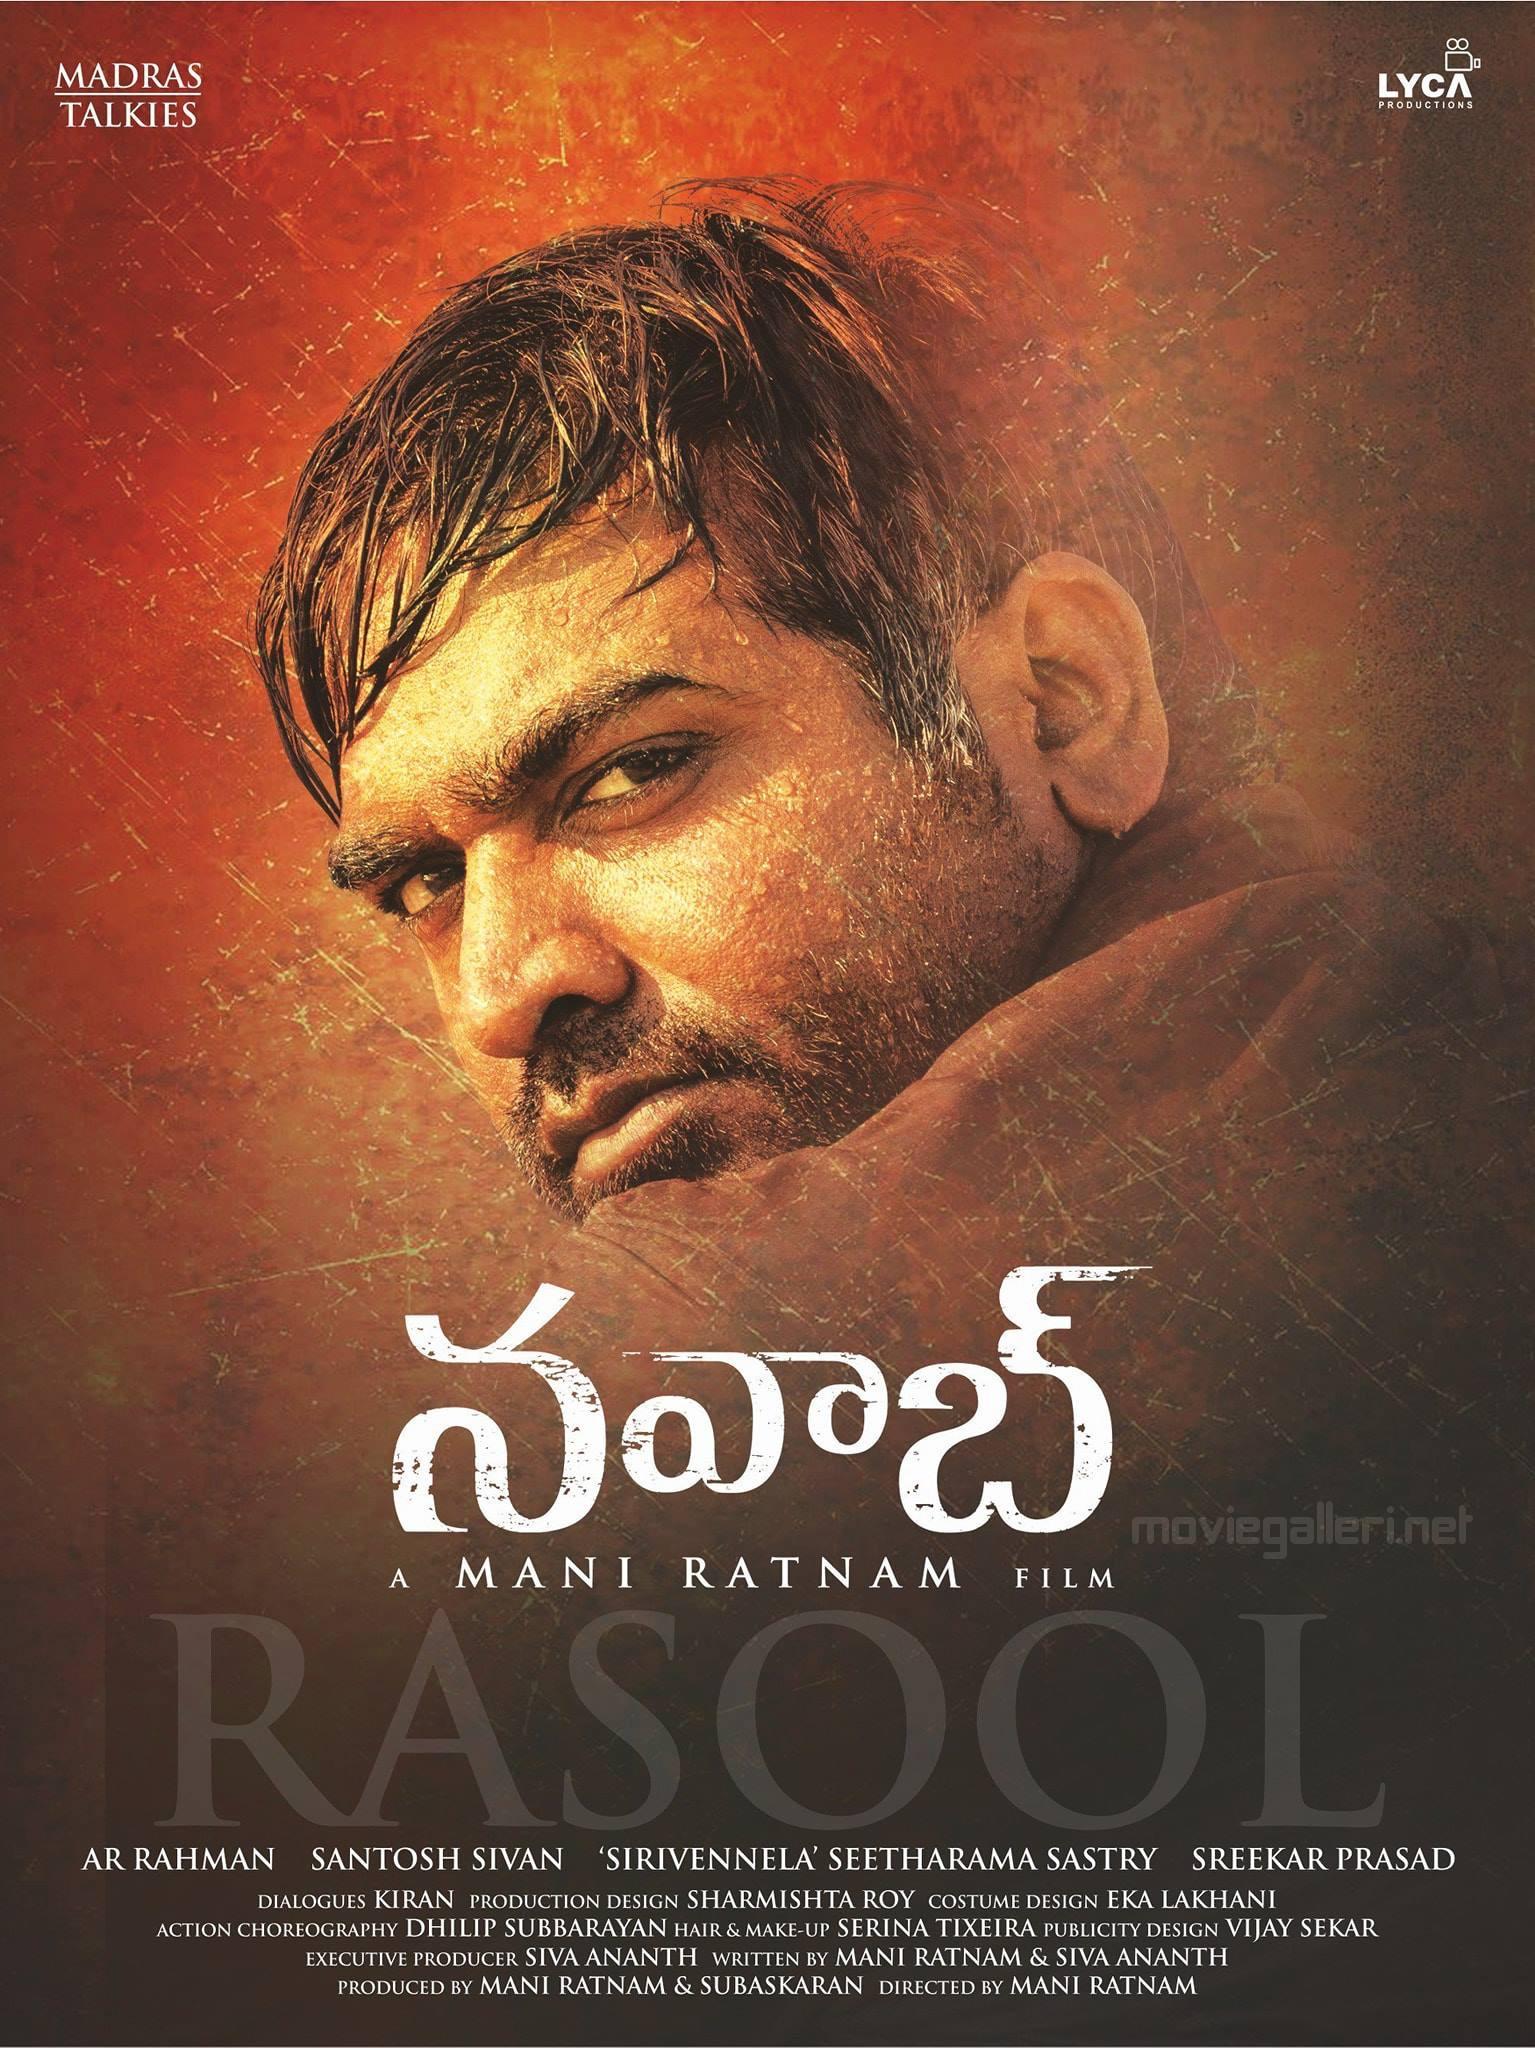 Actor Vijay Sethupathi As Rasool In Nawab Movie Poster Chekka Chivantha Vaanam In Telugu 1535x2048 Wallpaper Teahub Io Vijay sethupathi debuted to tamil cinema through the movie 'thenmerku paruvakaatru' in 2010. actor vijay sethupathi as rasool in